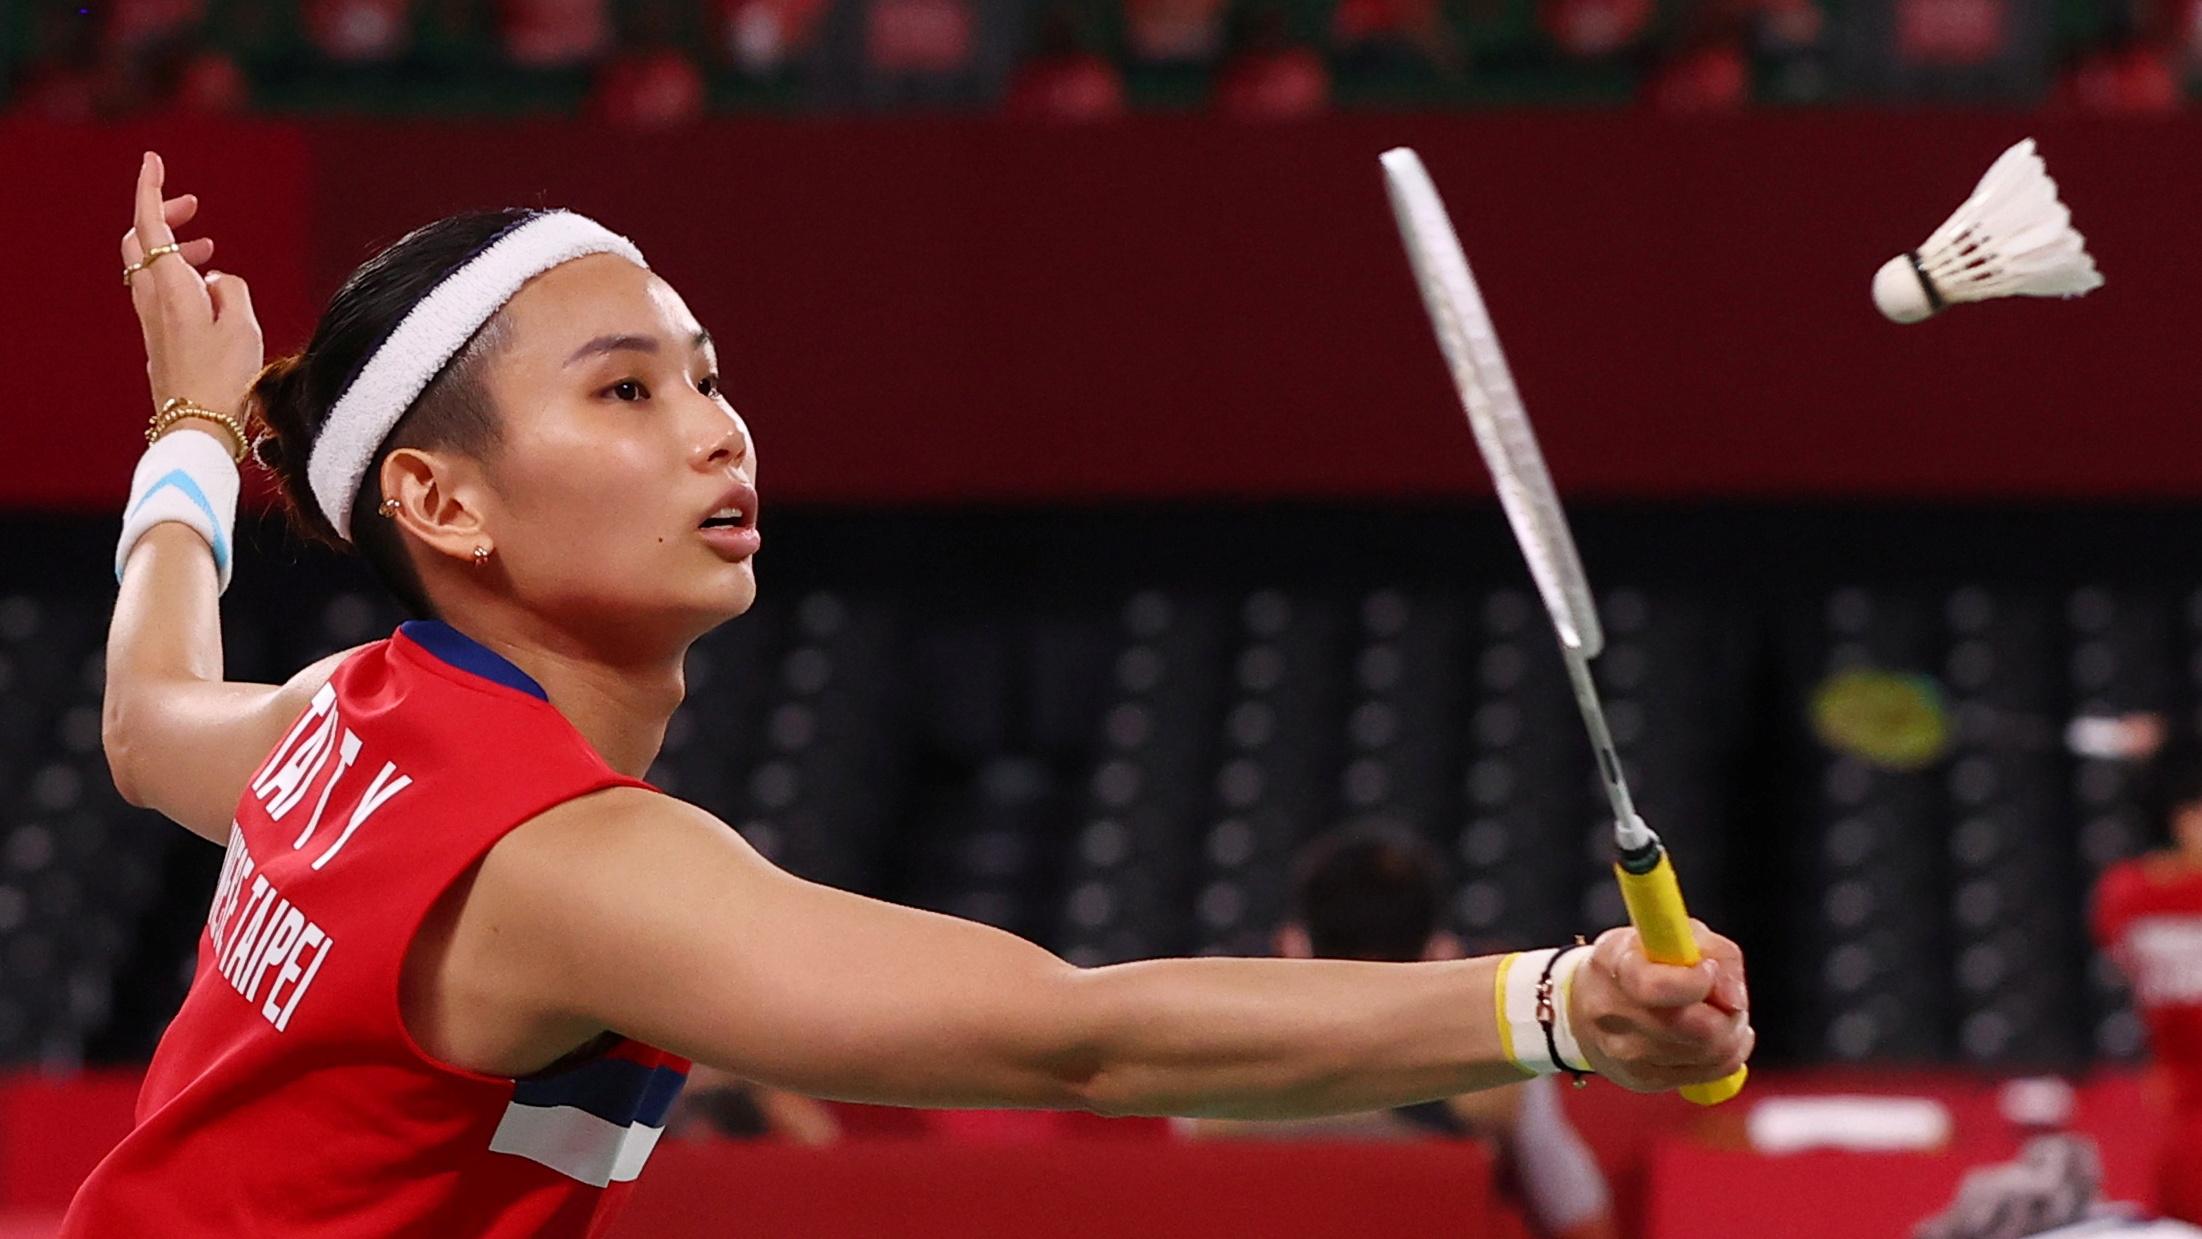 Badminton-Momota undone in shock upset; Tai Tzu Ying gets her mojo back |  Reuters